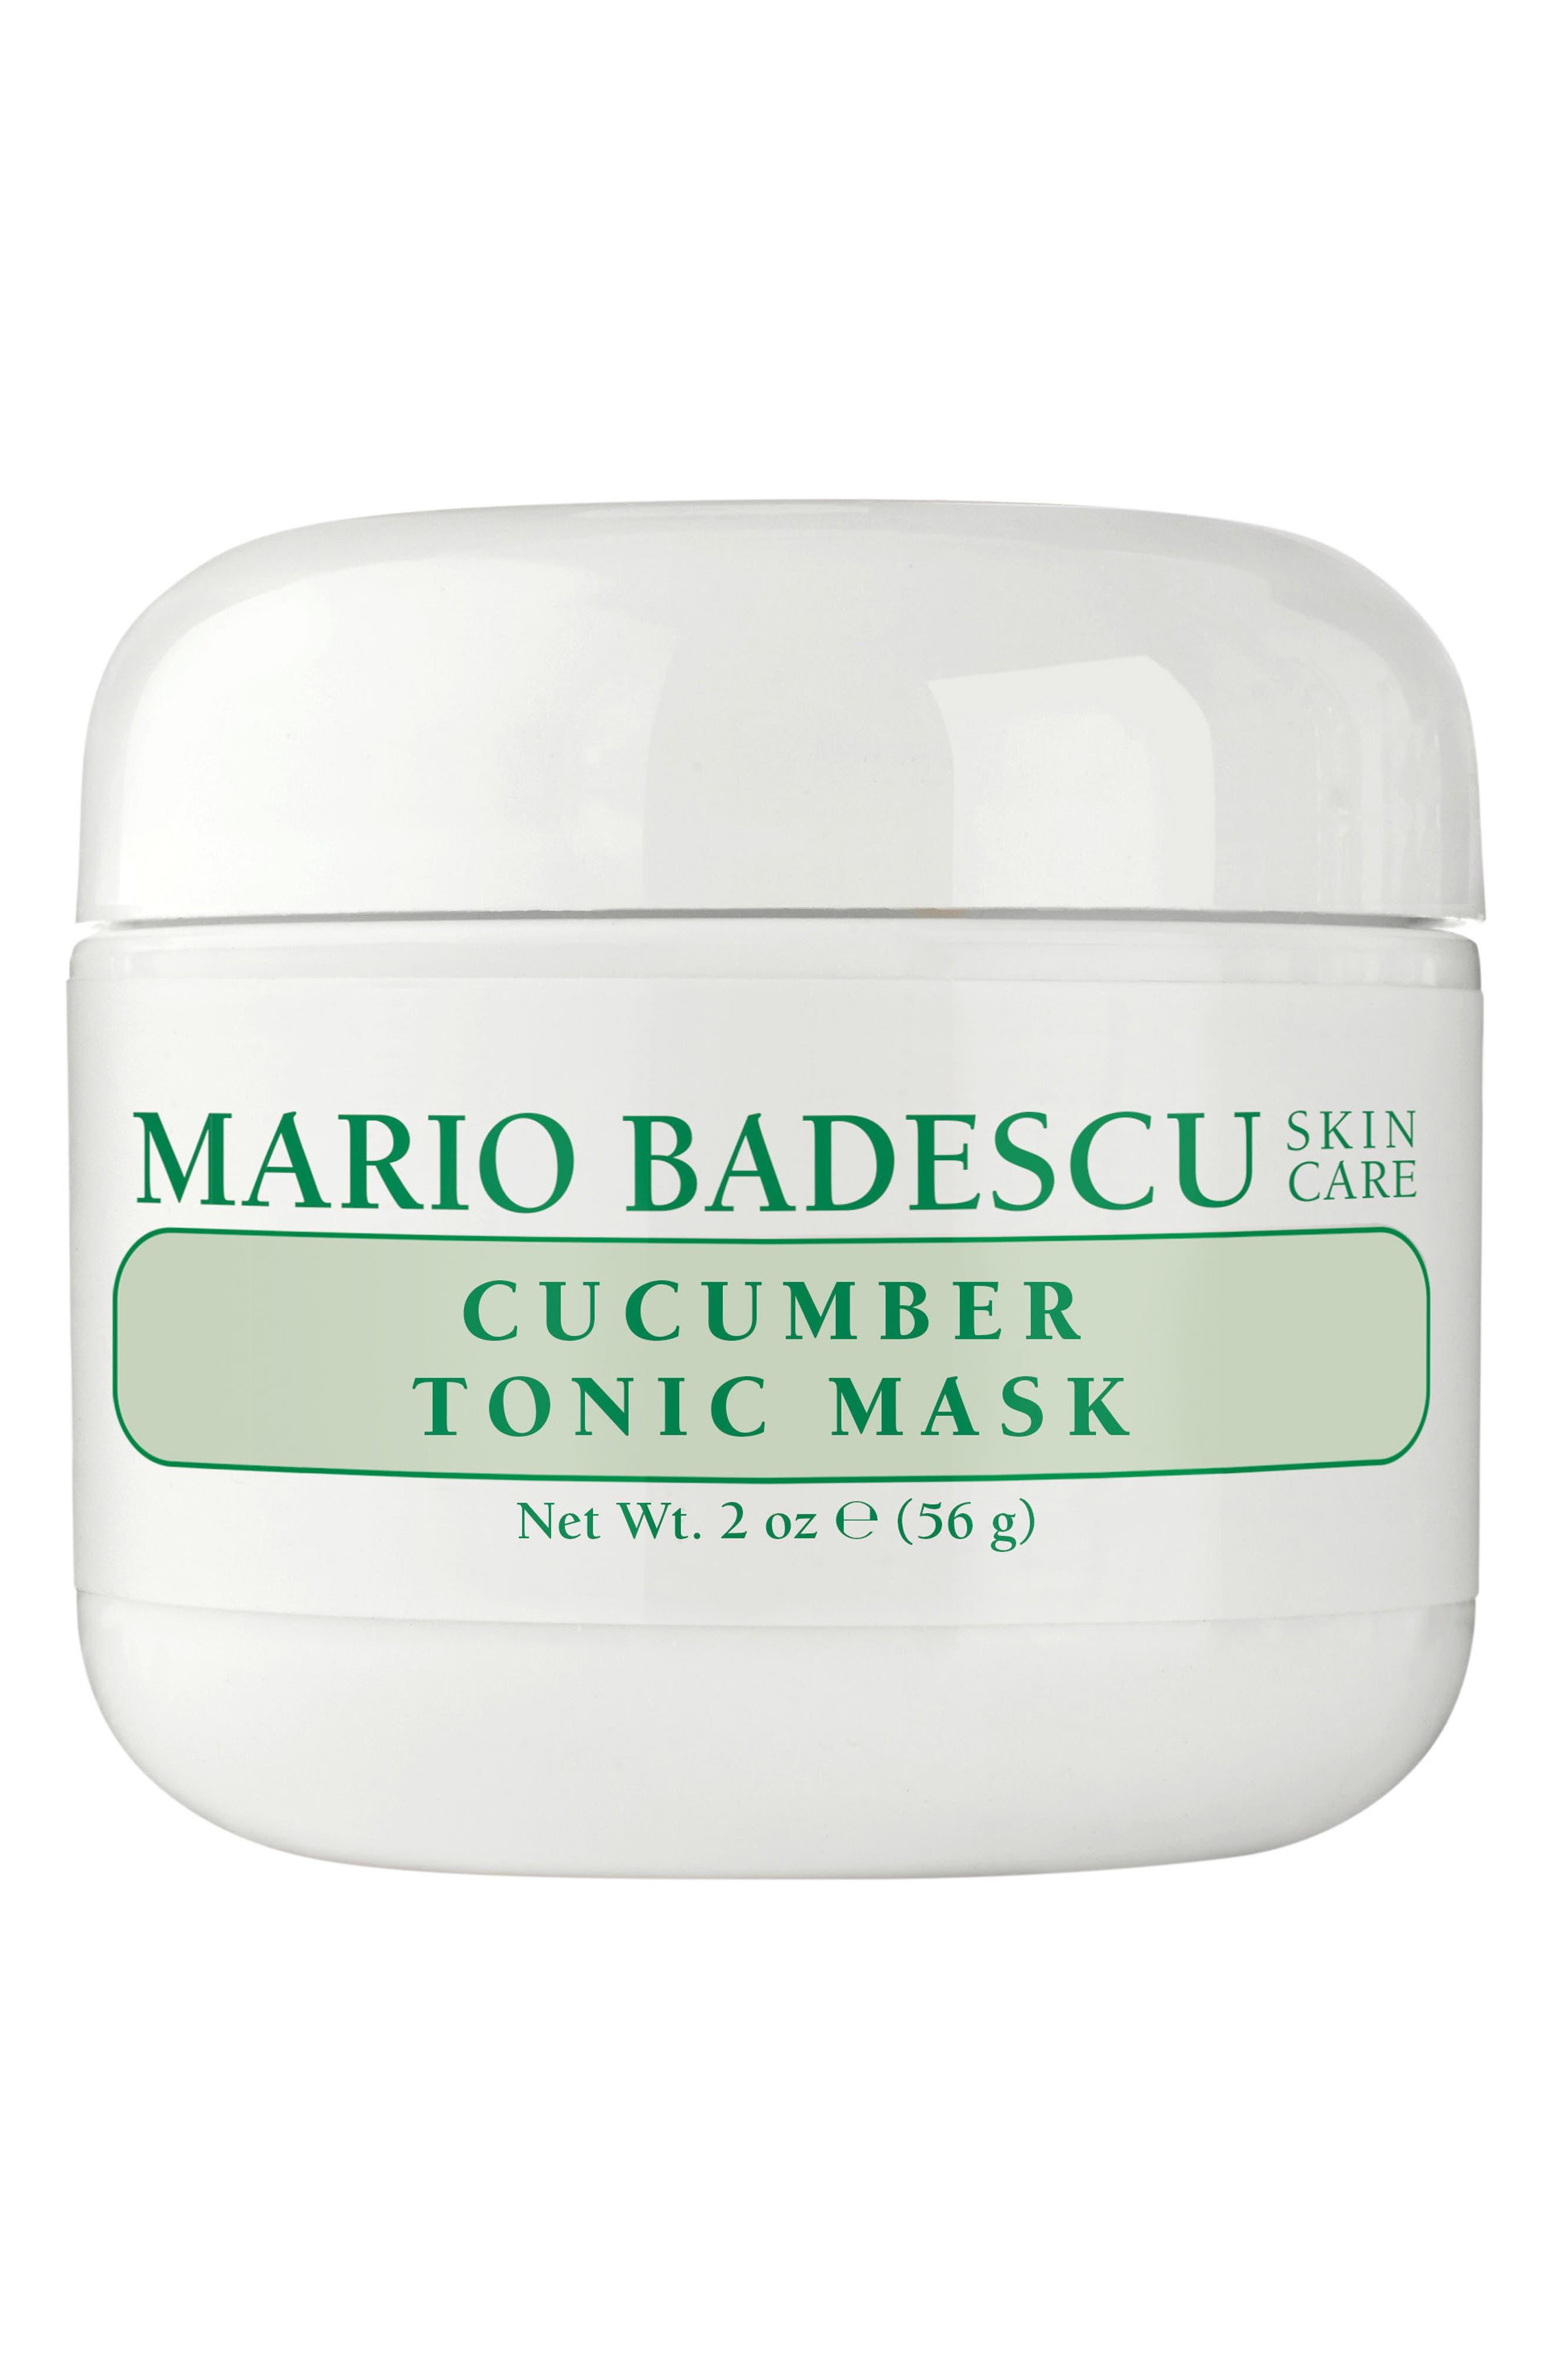 MARIO BADESCU Cucumber Tonic Mask, Main, color, NO COLOR